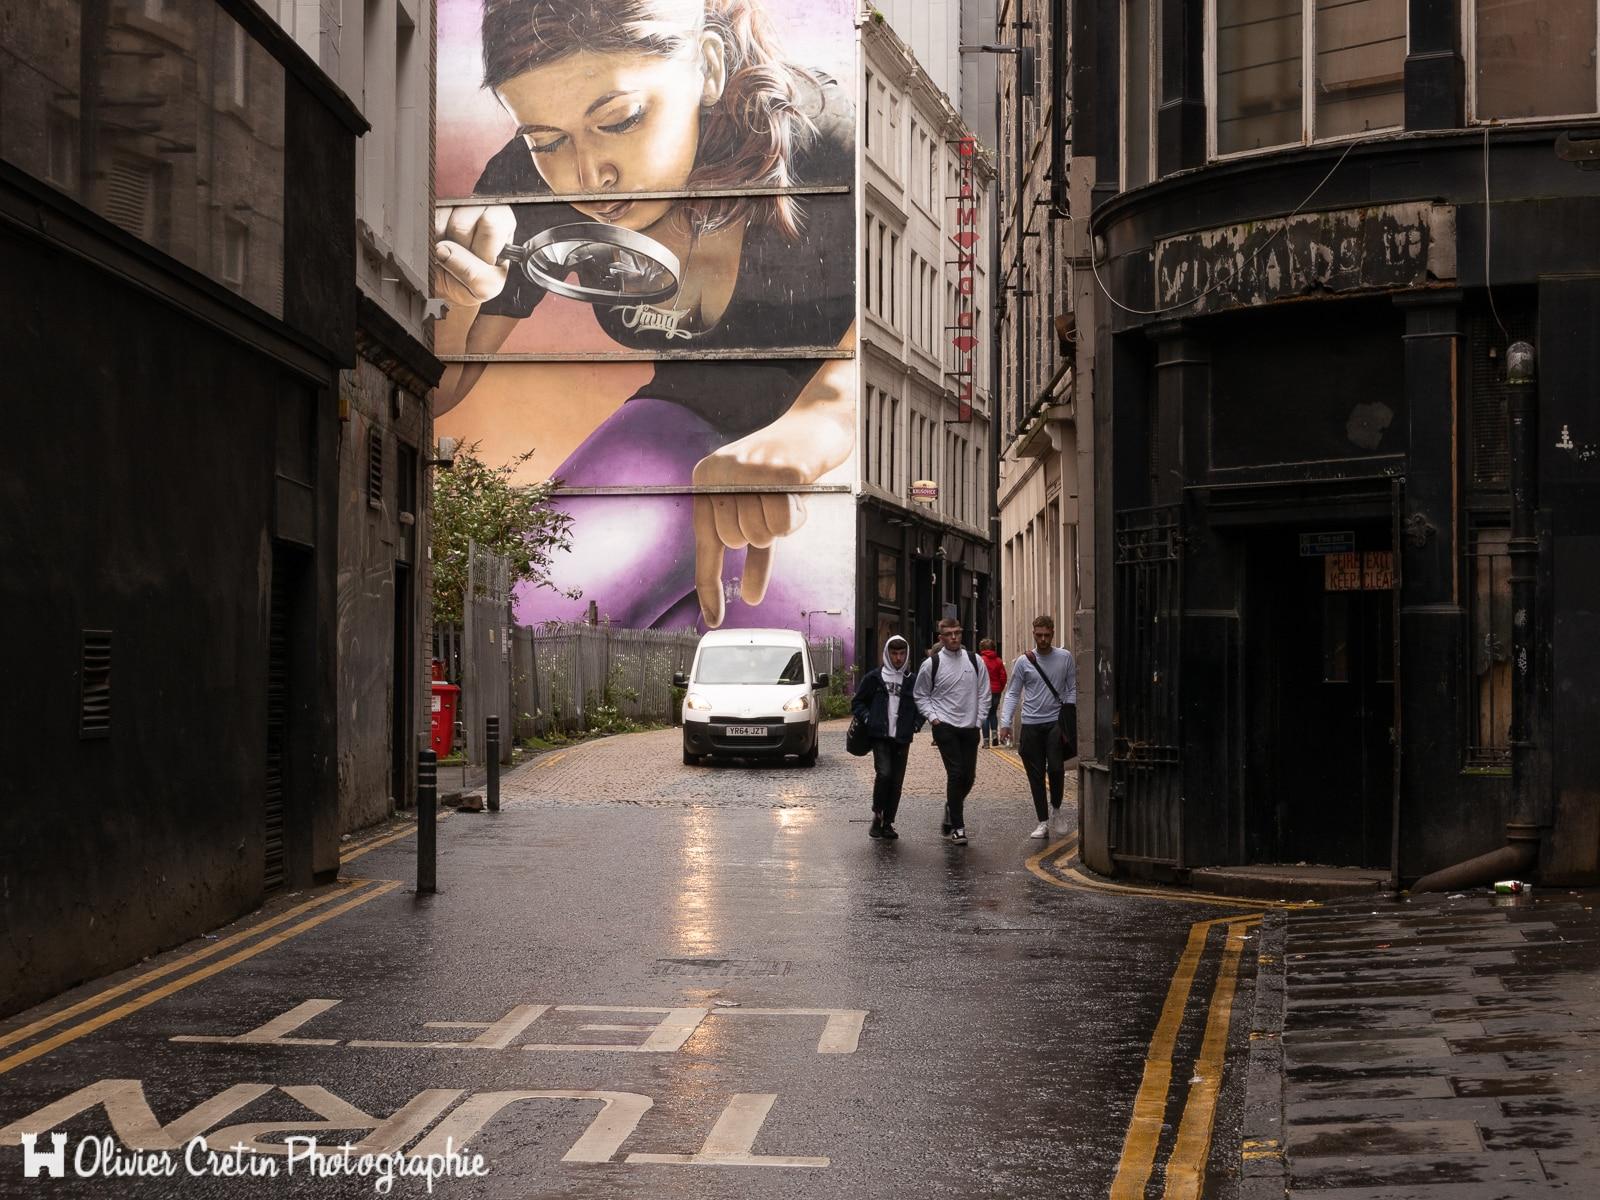 Ecosse - Glasgow - Attention la fourgonnette !